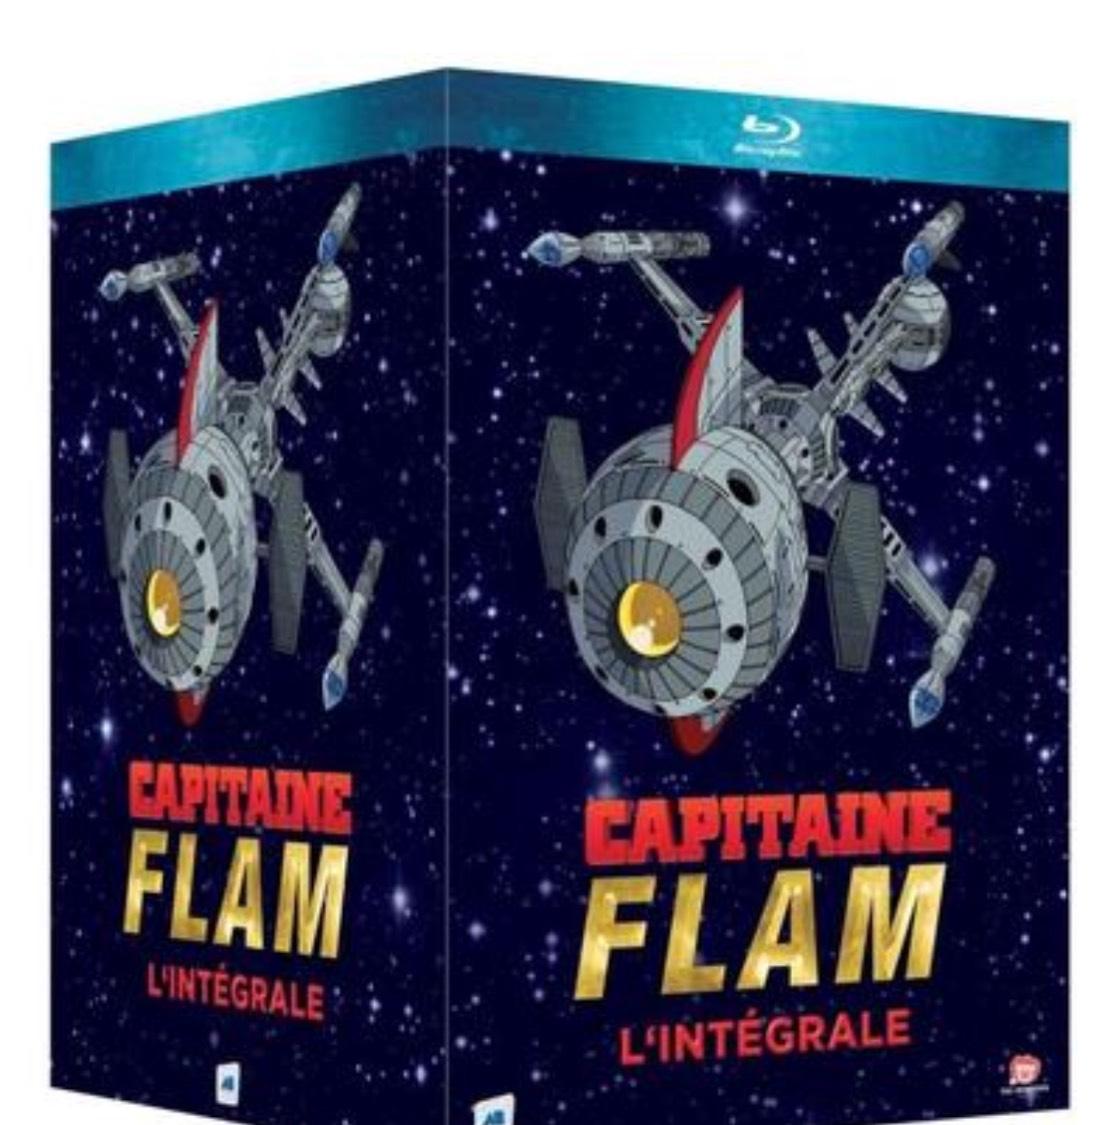 Coffret Blu-ray Capitaine Flam -  Intégrale (3 volumes)